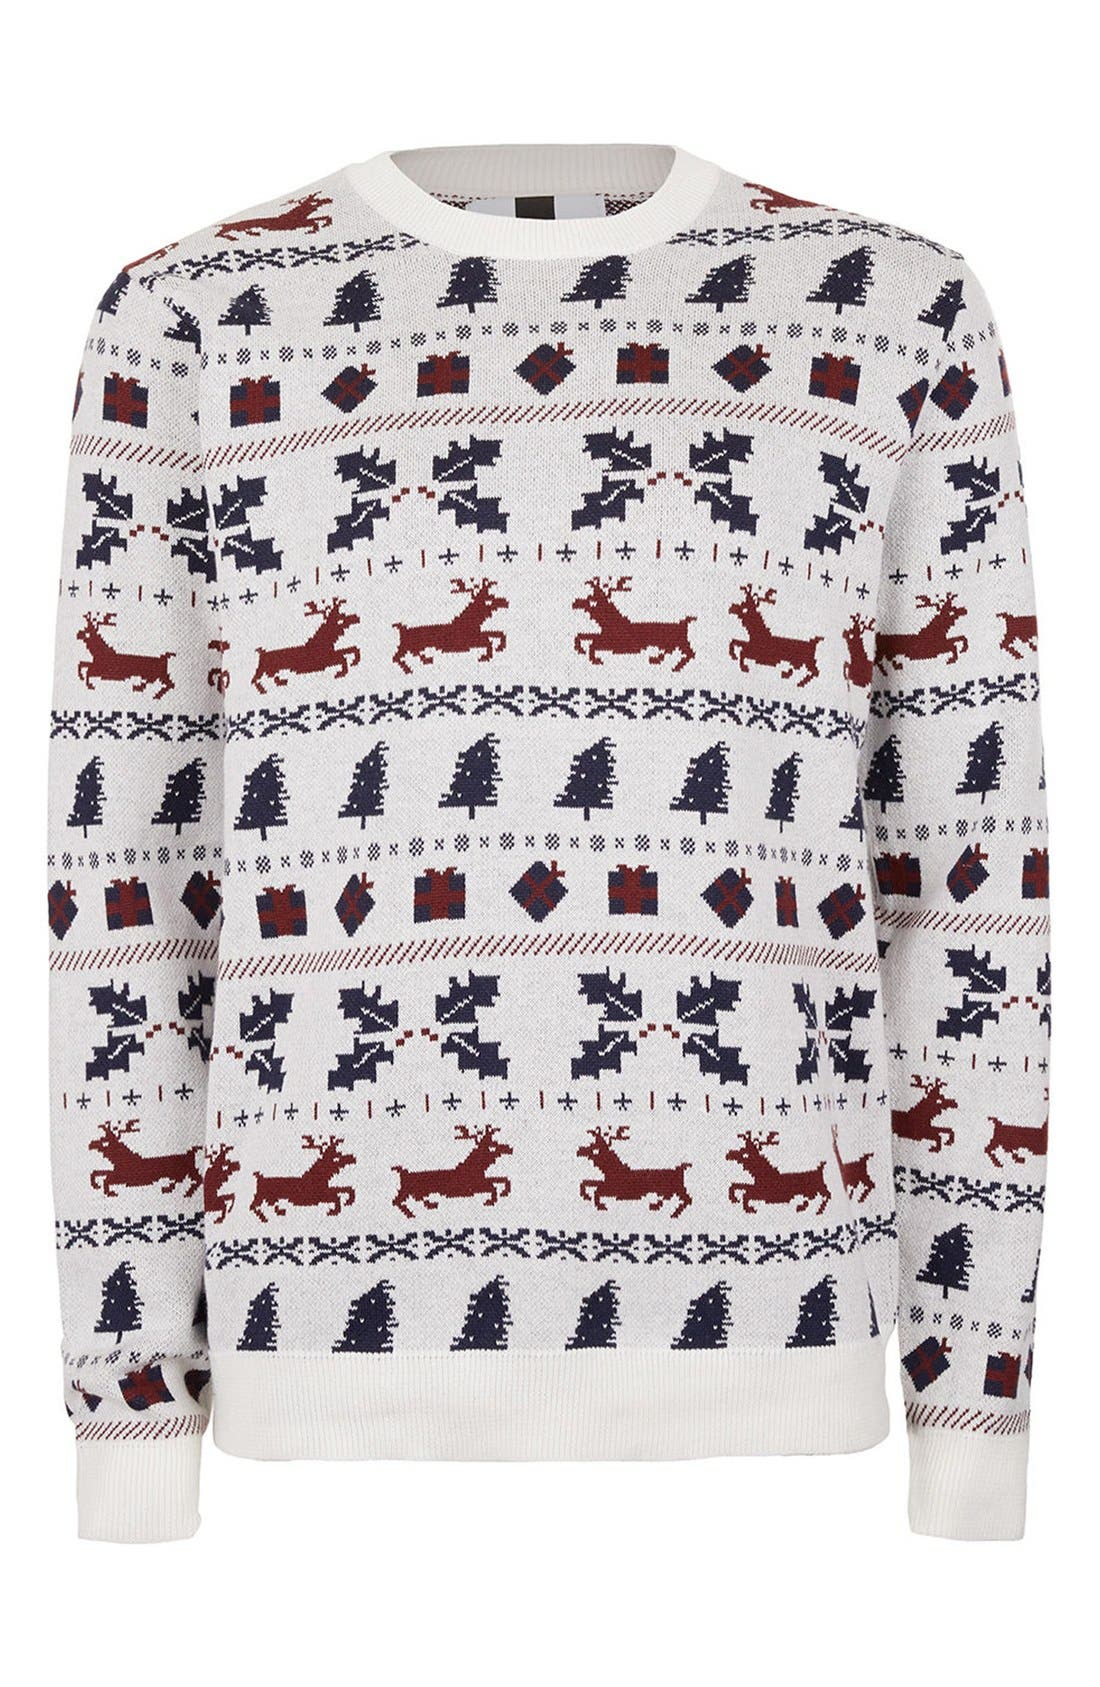 TOPMAN,                             Christmas Fair Isle Sweater,                             Alternate thumbnail 4, color,                             901